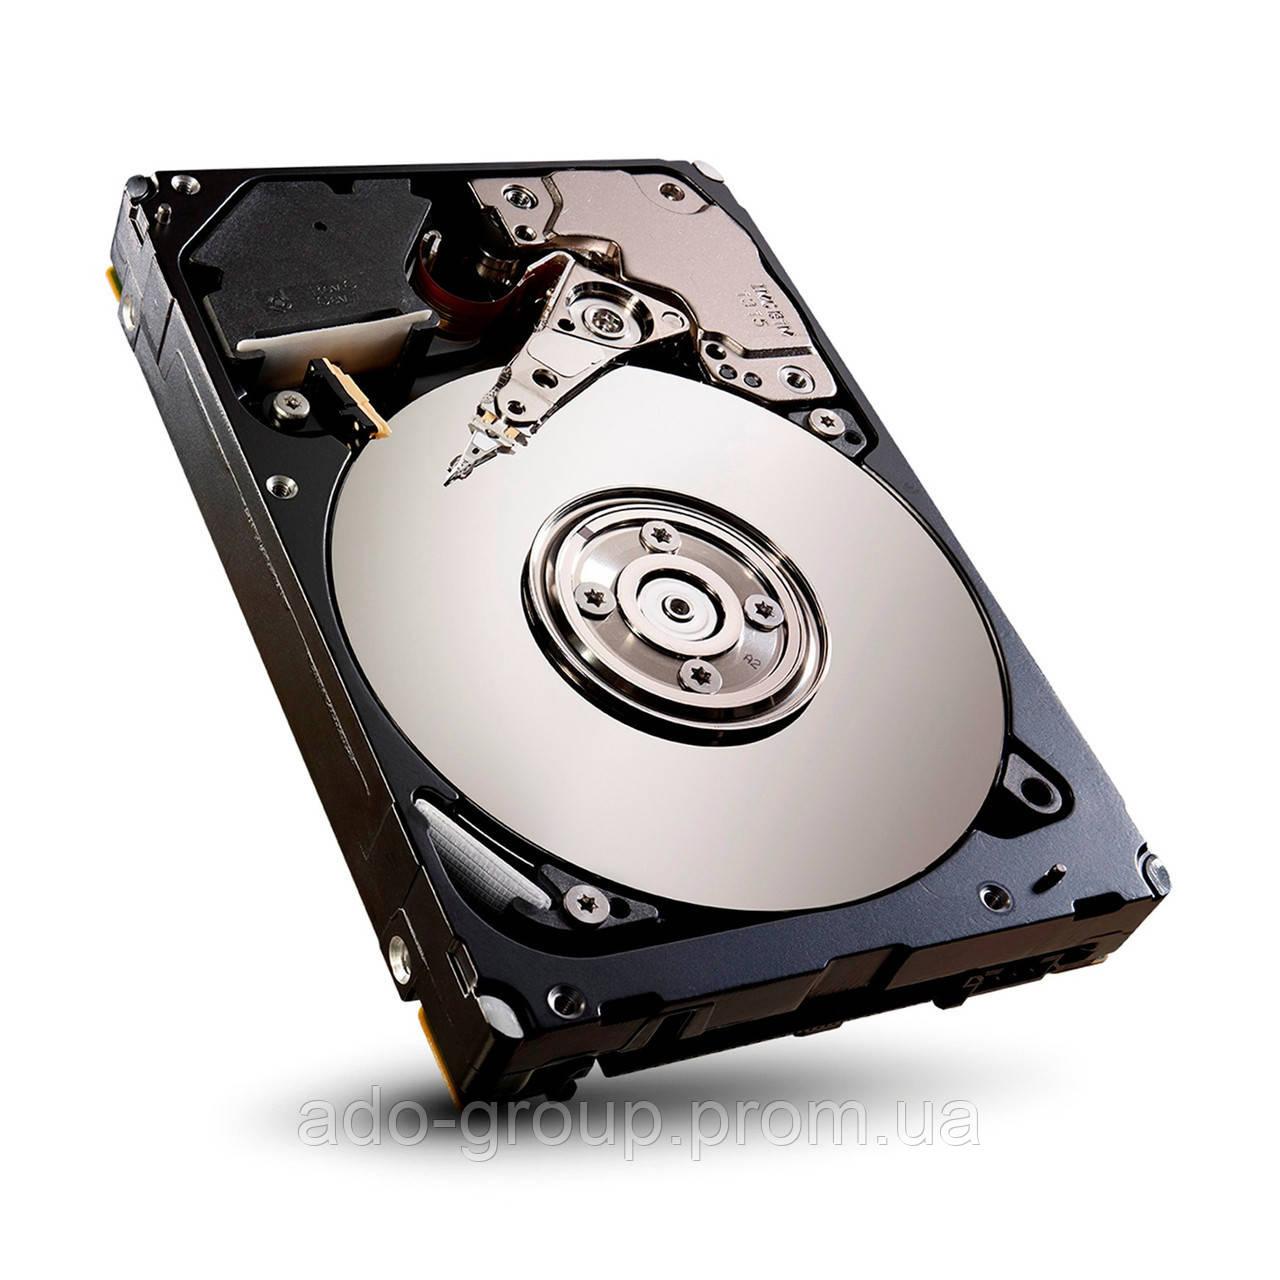 "408995-002 Жесткий диск HP 80GB ATA 7.2K  3.5"" +"